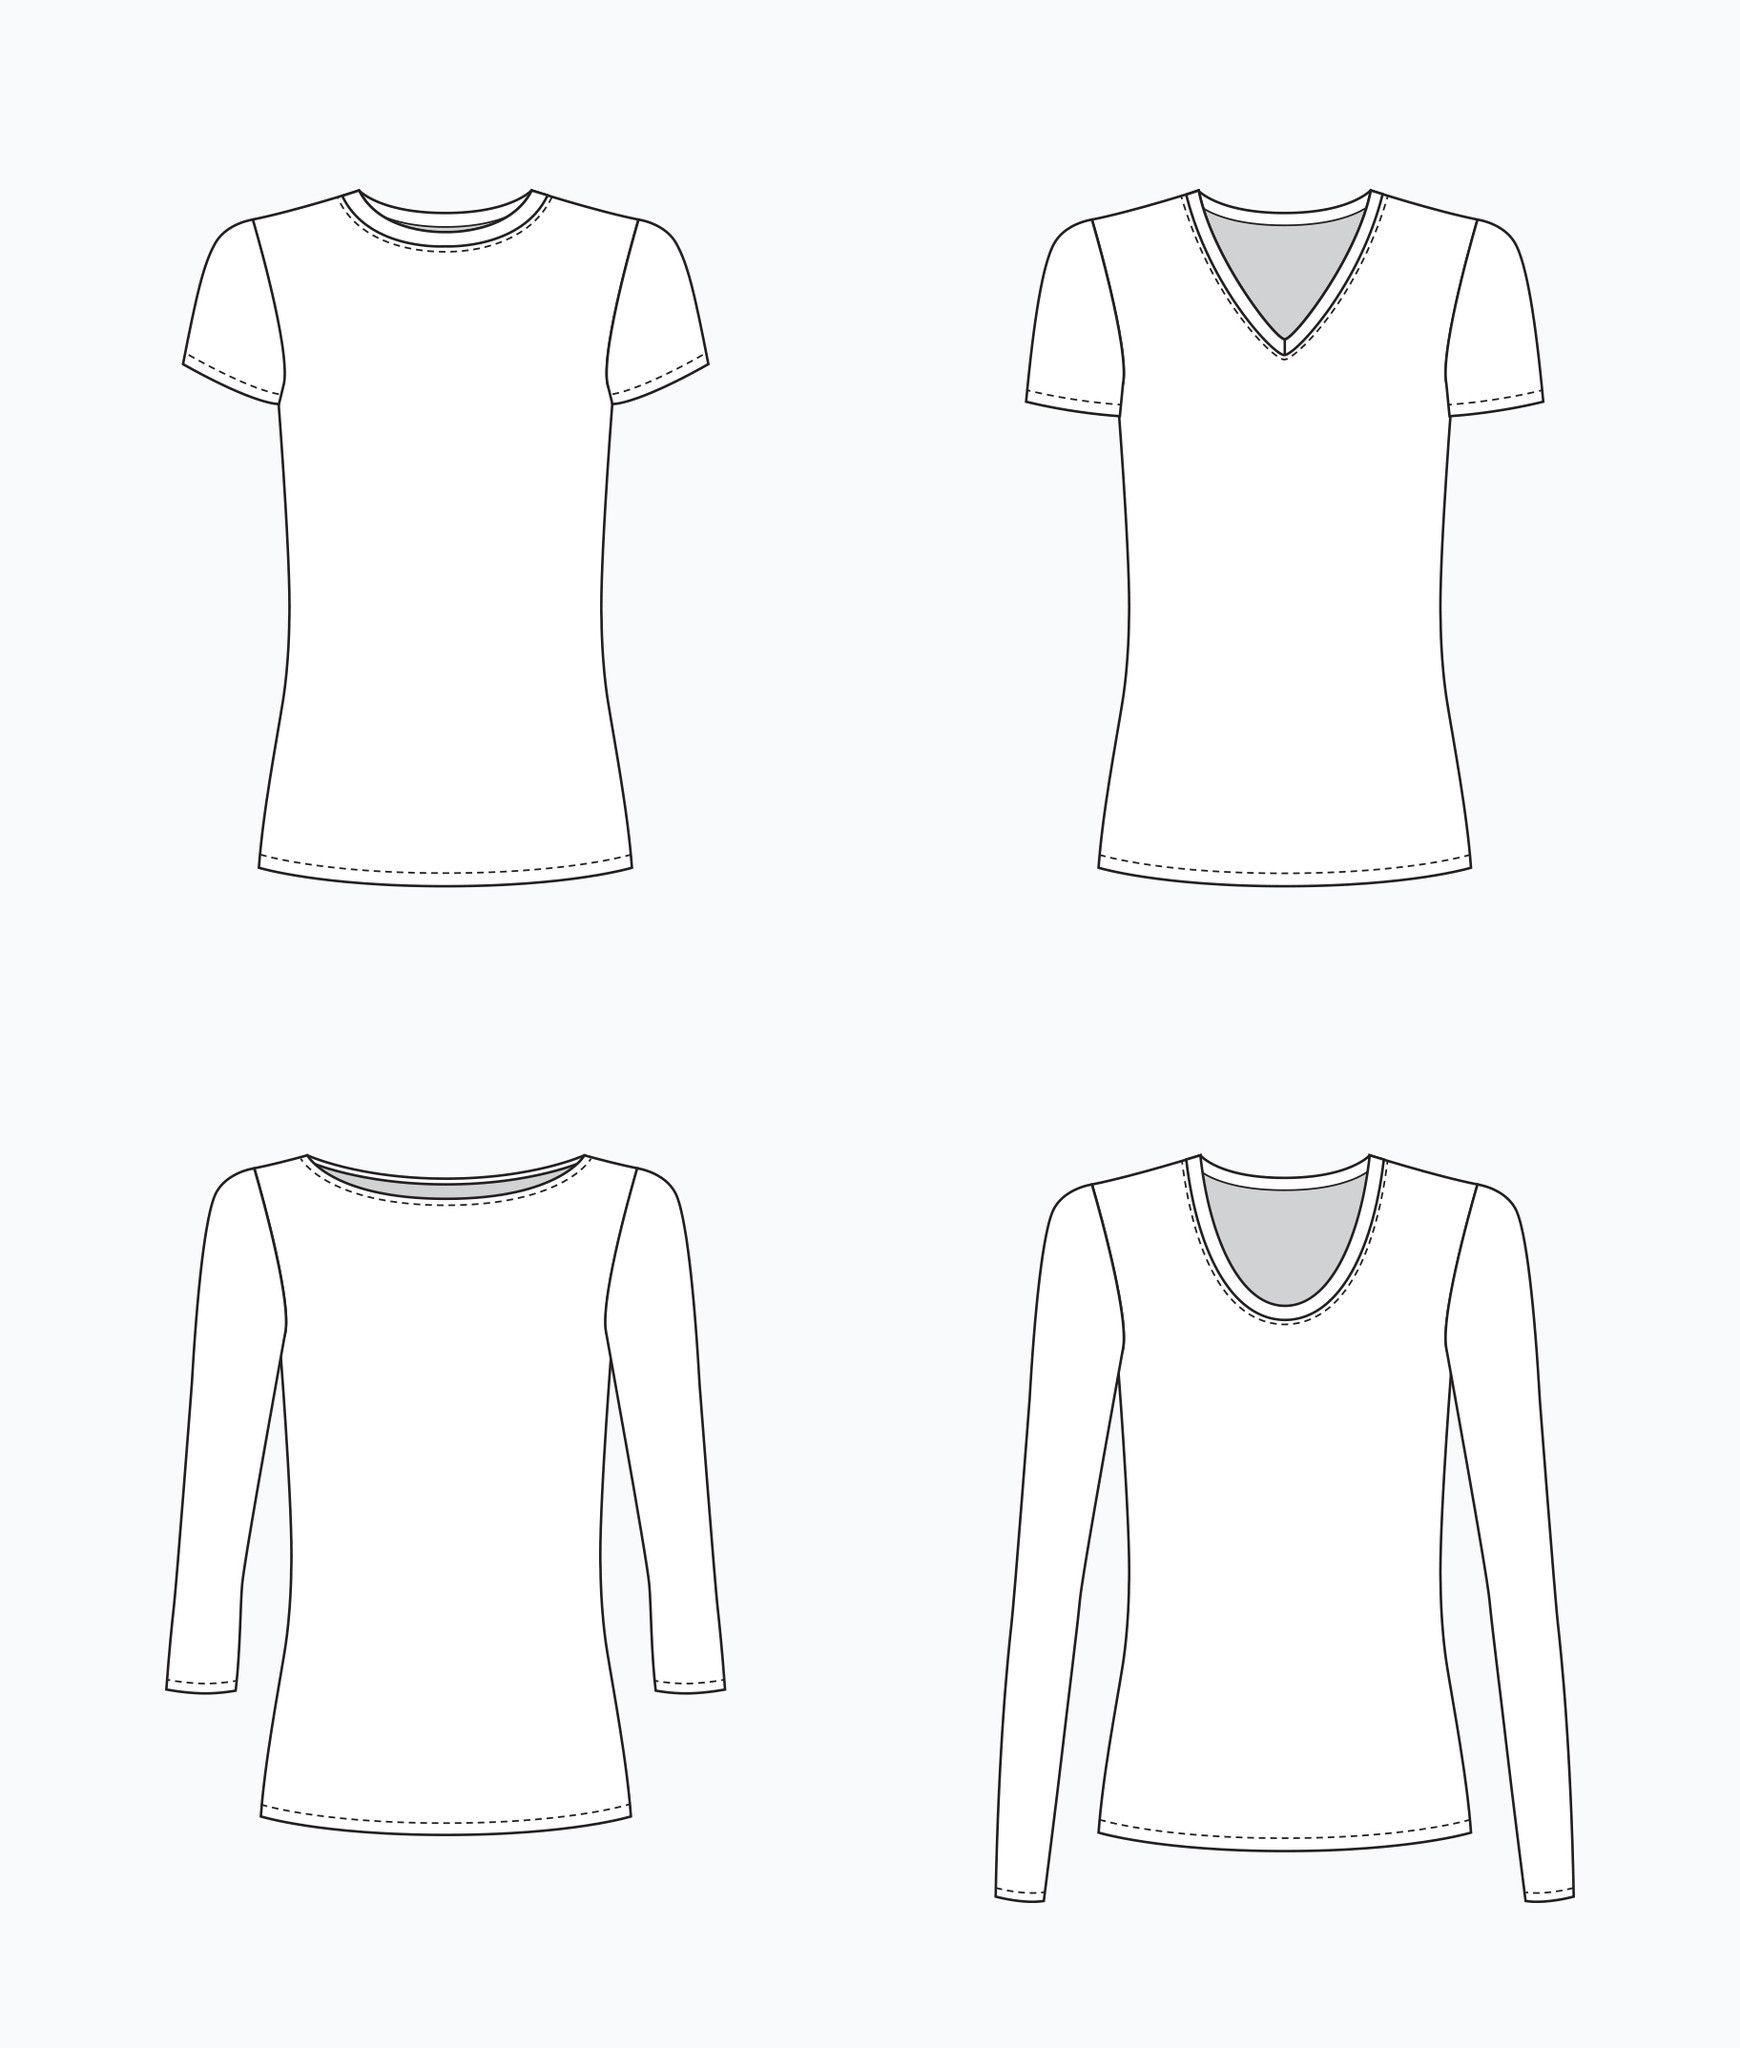 Lark Tee - Paper Pattern | Blusen, Schnittmuster und Inspiration